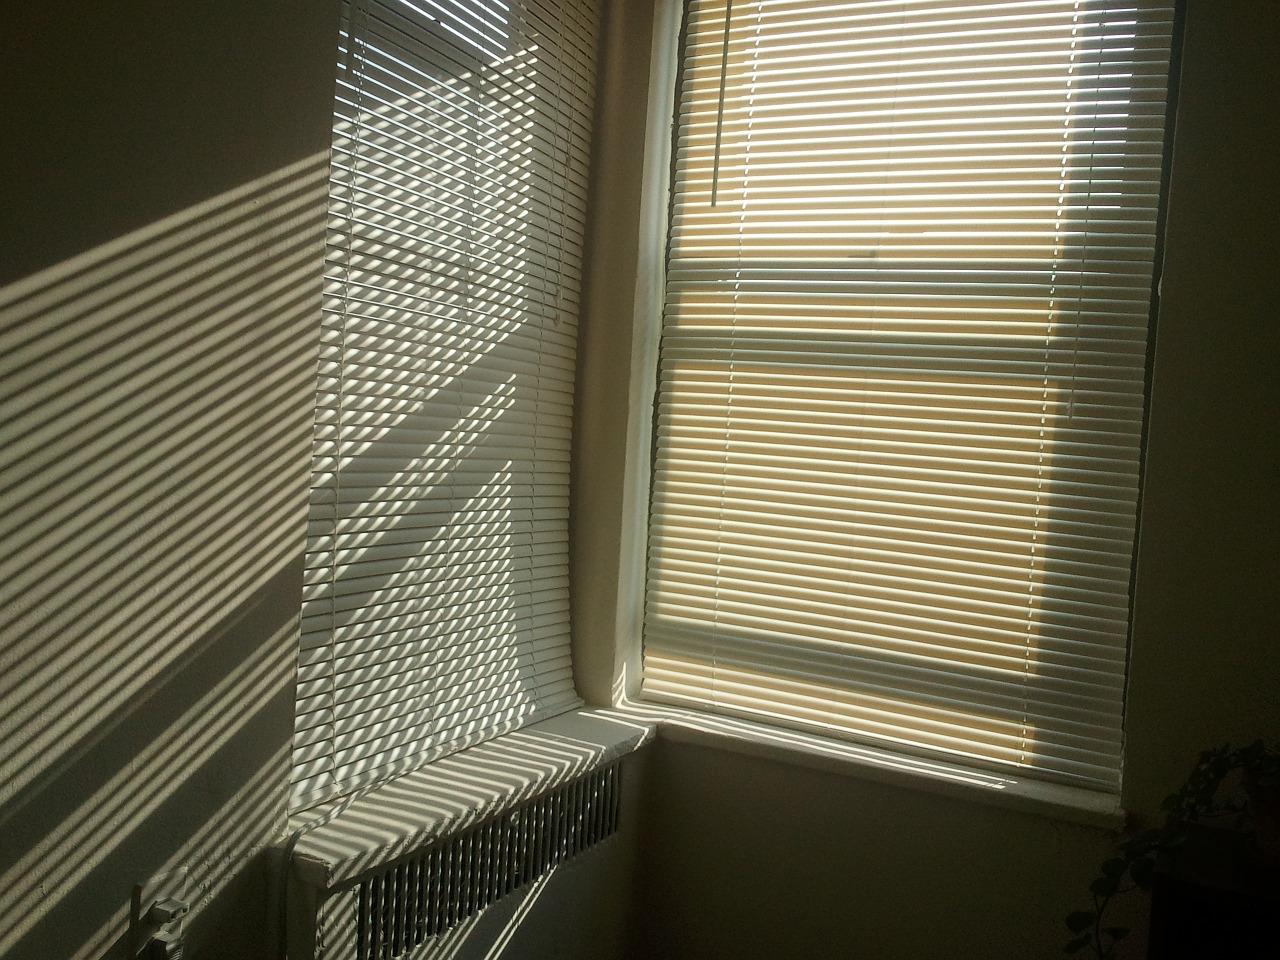 sunlight-668257_1280